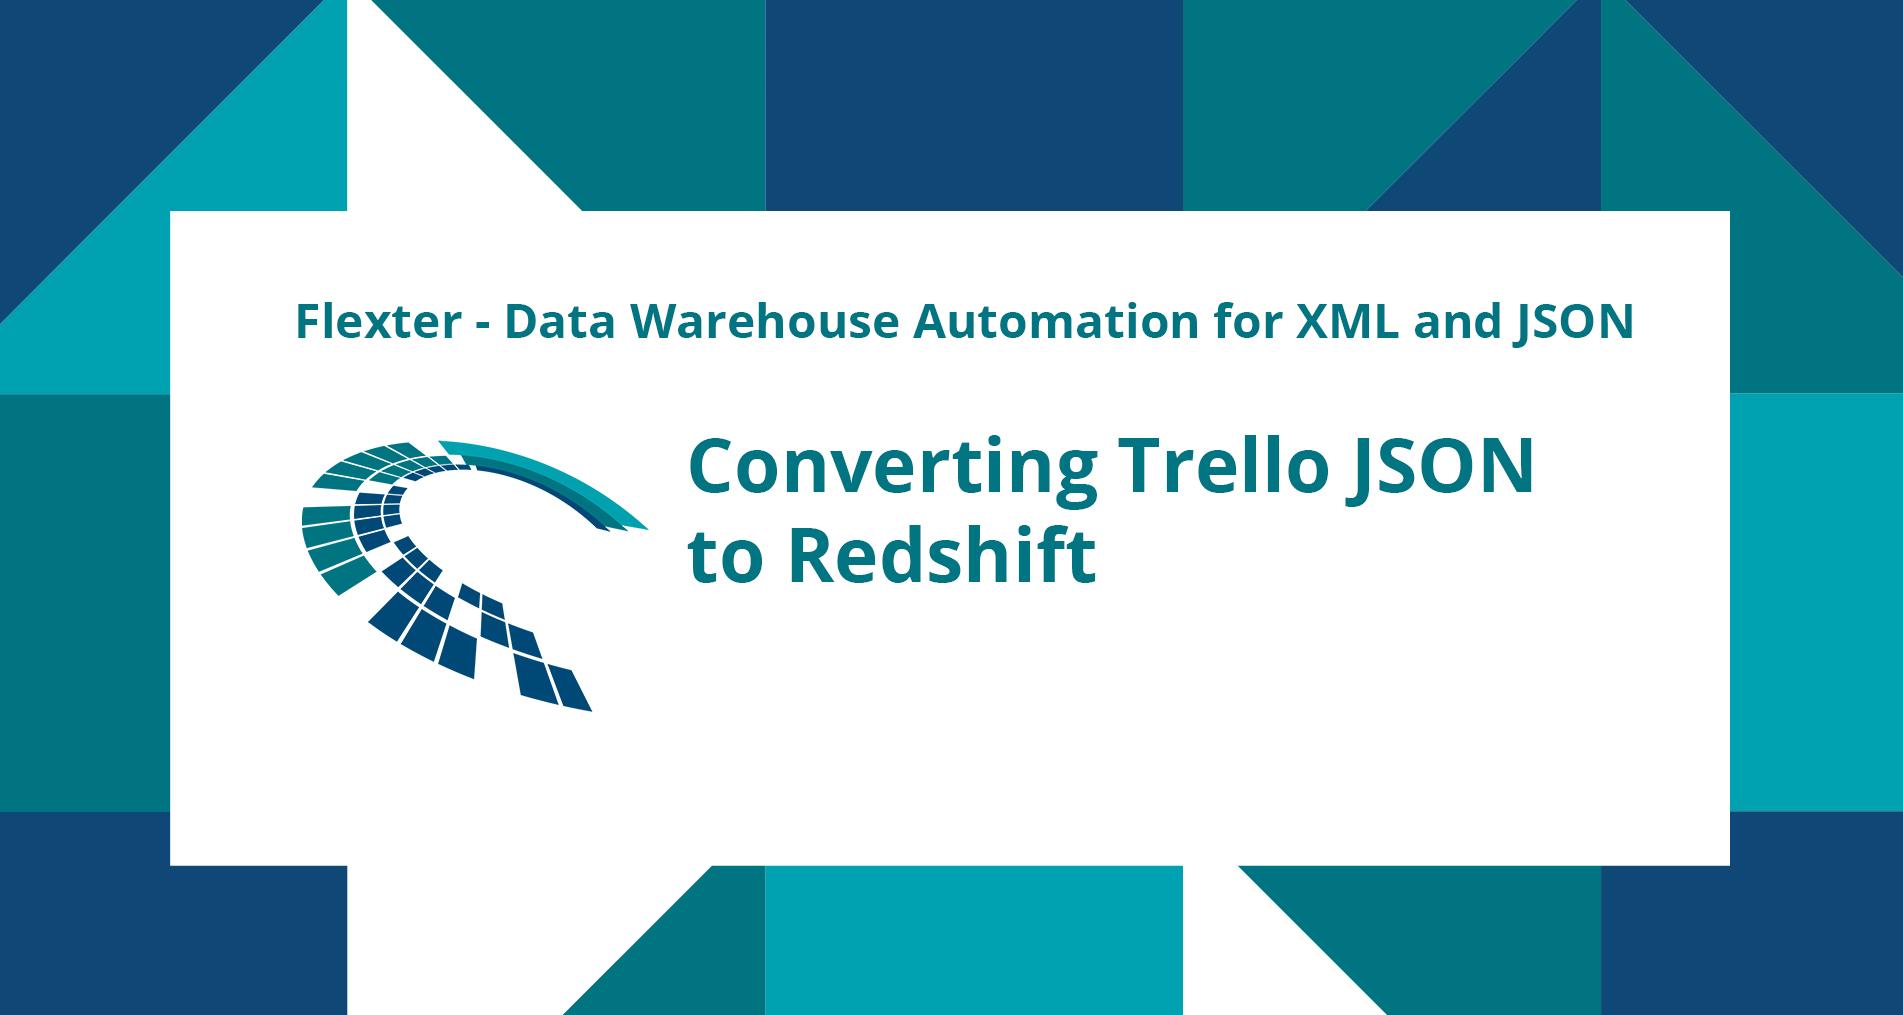 Converting Trello JSON to Redshift - Sonra